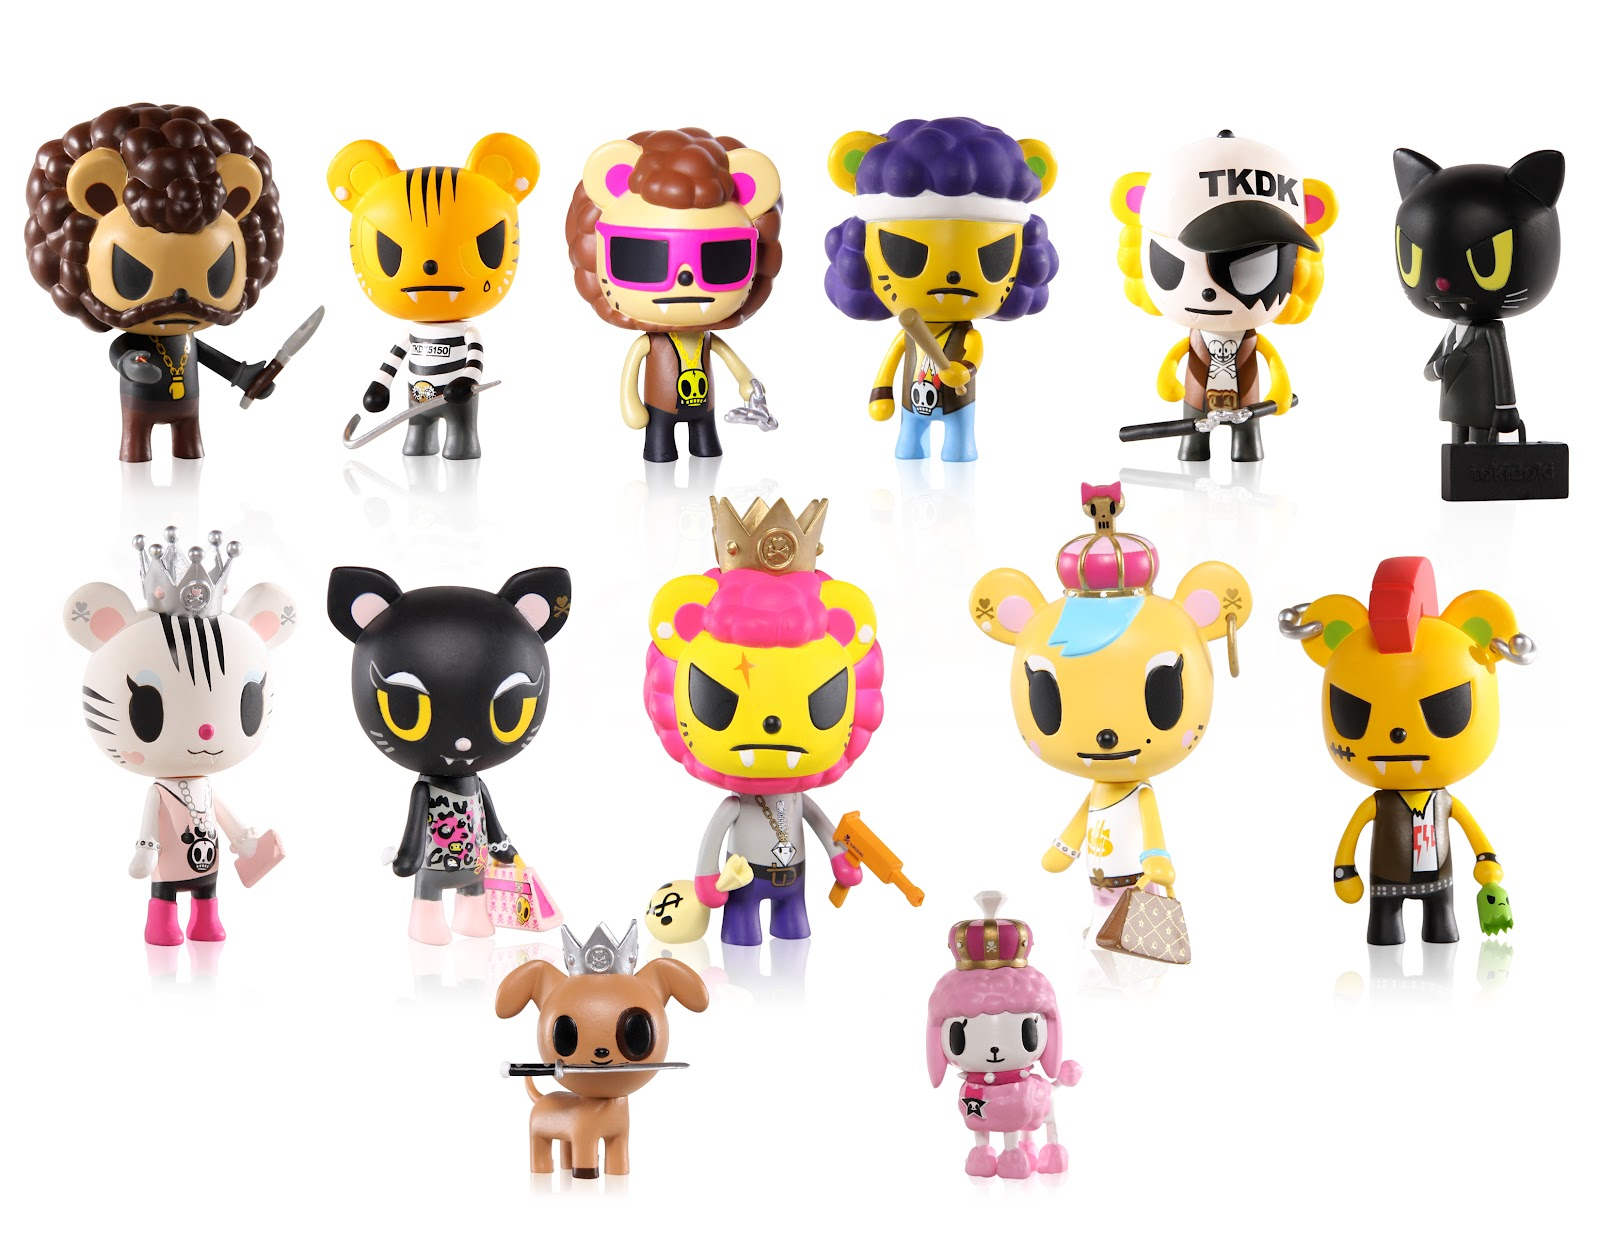 http://1.bp.blogspot.com/-sx2-qcrBPXM/UCQHNeqOE3I/AAAAAAAAT_A/HBzy83KK3xo/s1600/tokidoki+Royal+Pride+PVC+Mini+Figures.jpg